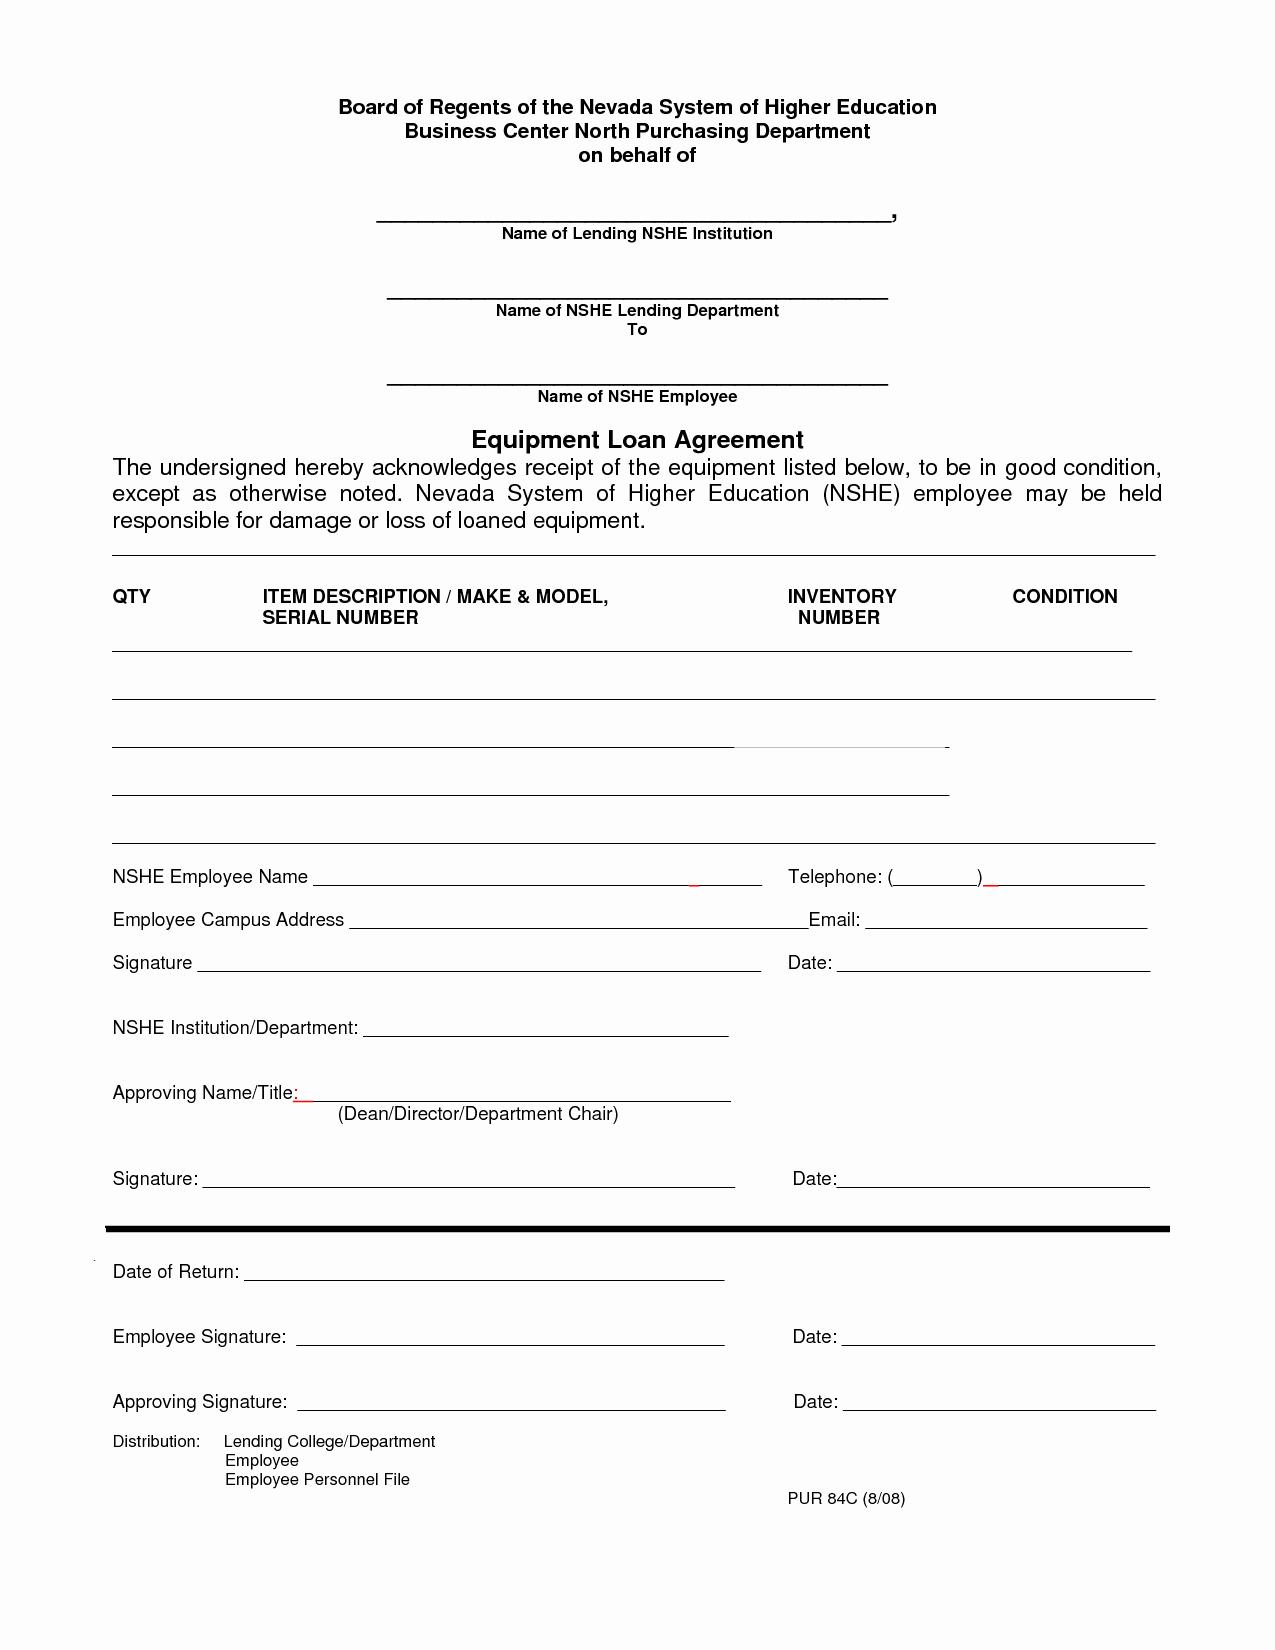 Equipment Loan Agreement Template Inspirational 10 Best Of Employee Loan Agreement Employee Loan